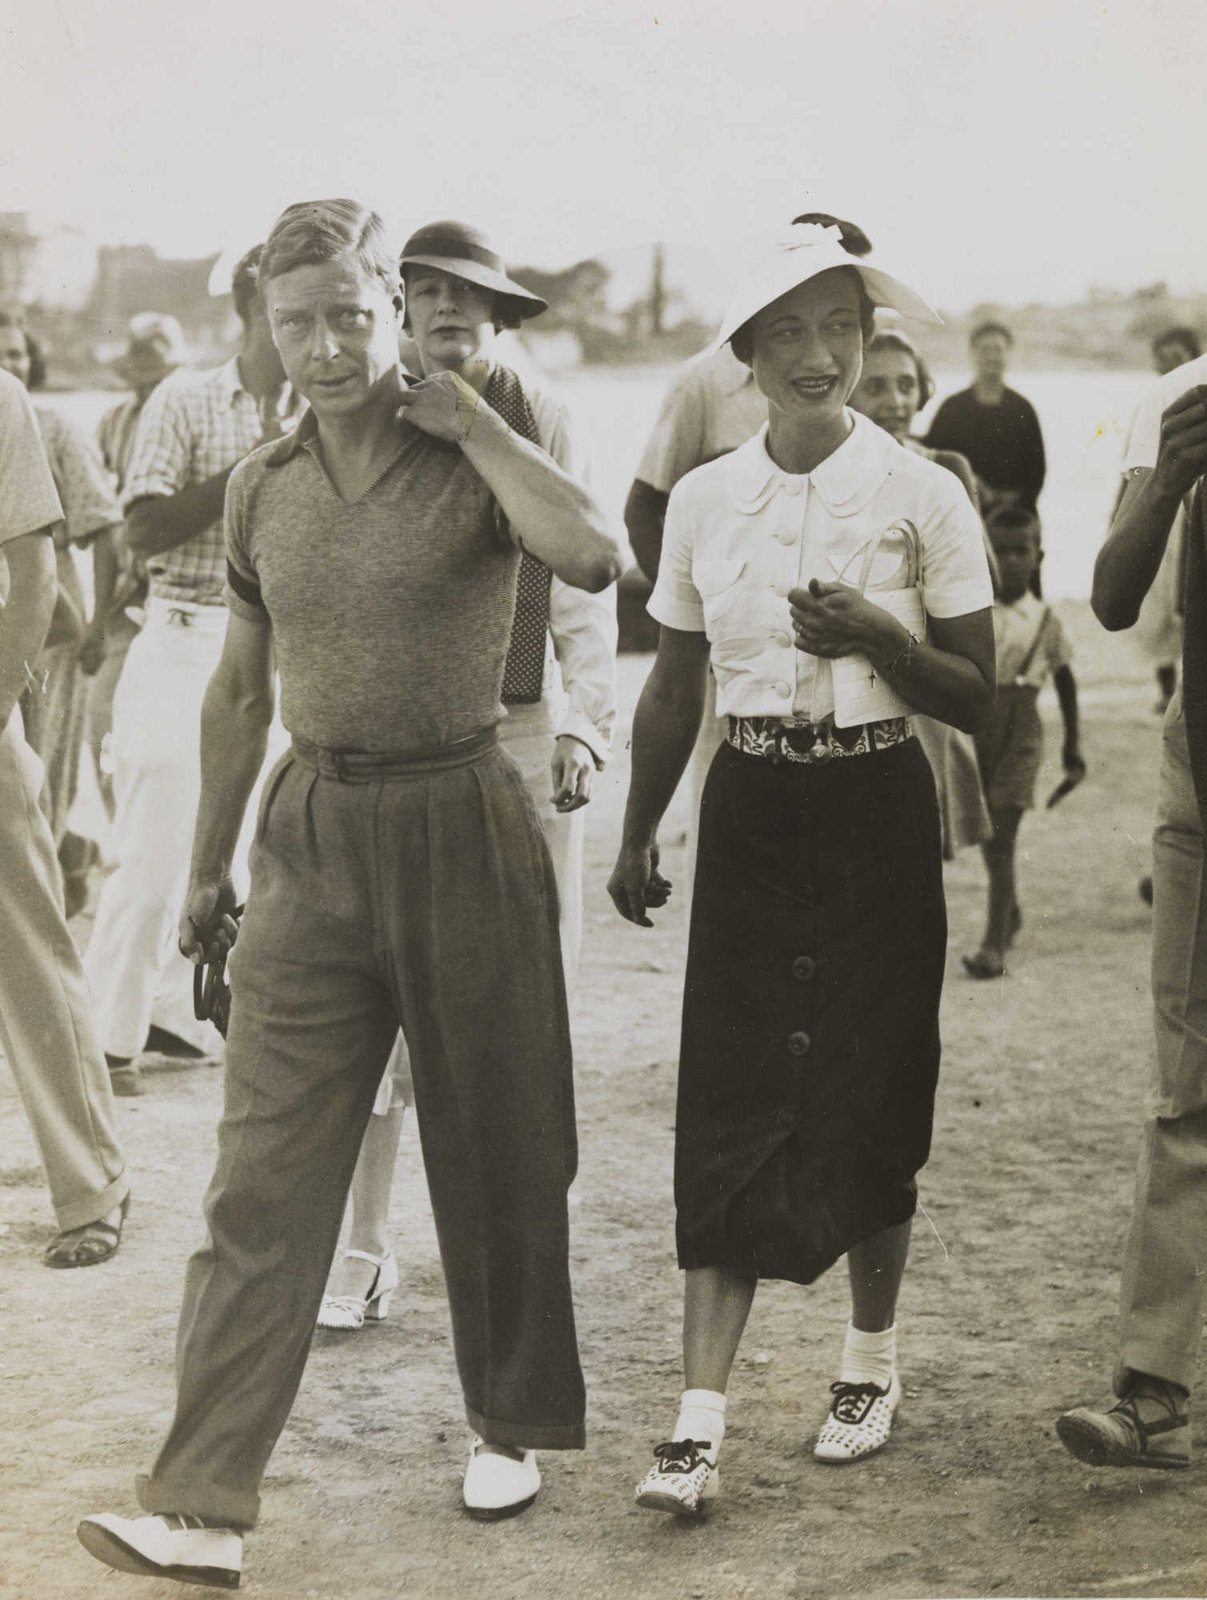 King Edward VIII and Mrs. Wallis Simpson on holiday in Yugoslavia, August 1936.